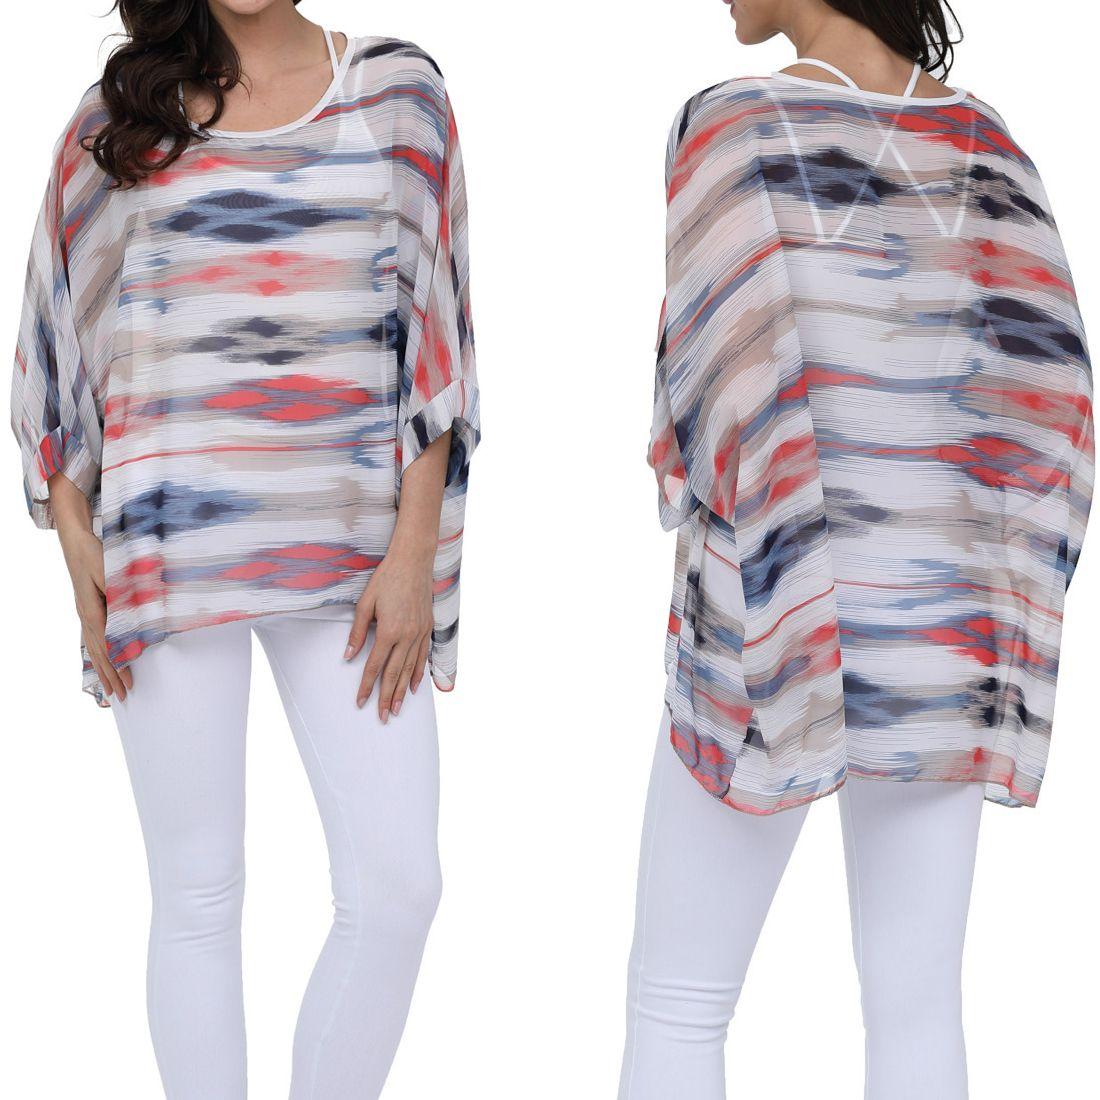 026557b86eb1 Fashion Women Loose Blouse Mixed Color Printed O-Neck Dolman Sleeve ...